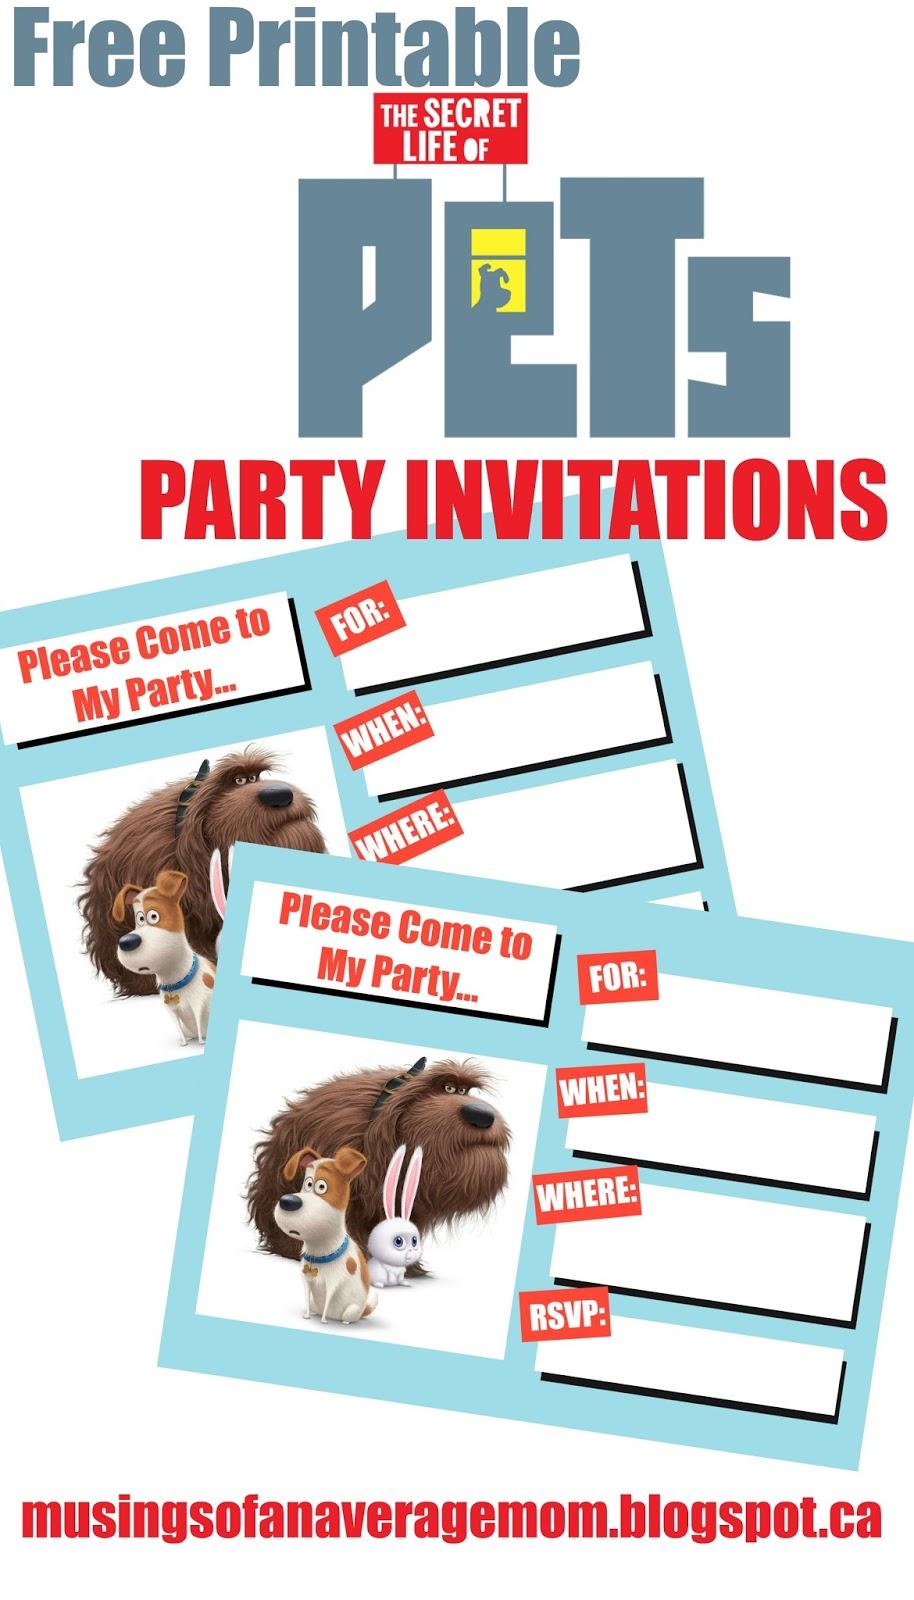 Invite Dropbox as beautiful invitations ideas